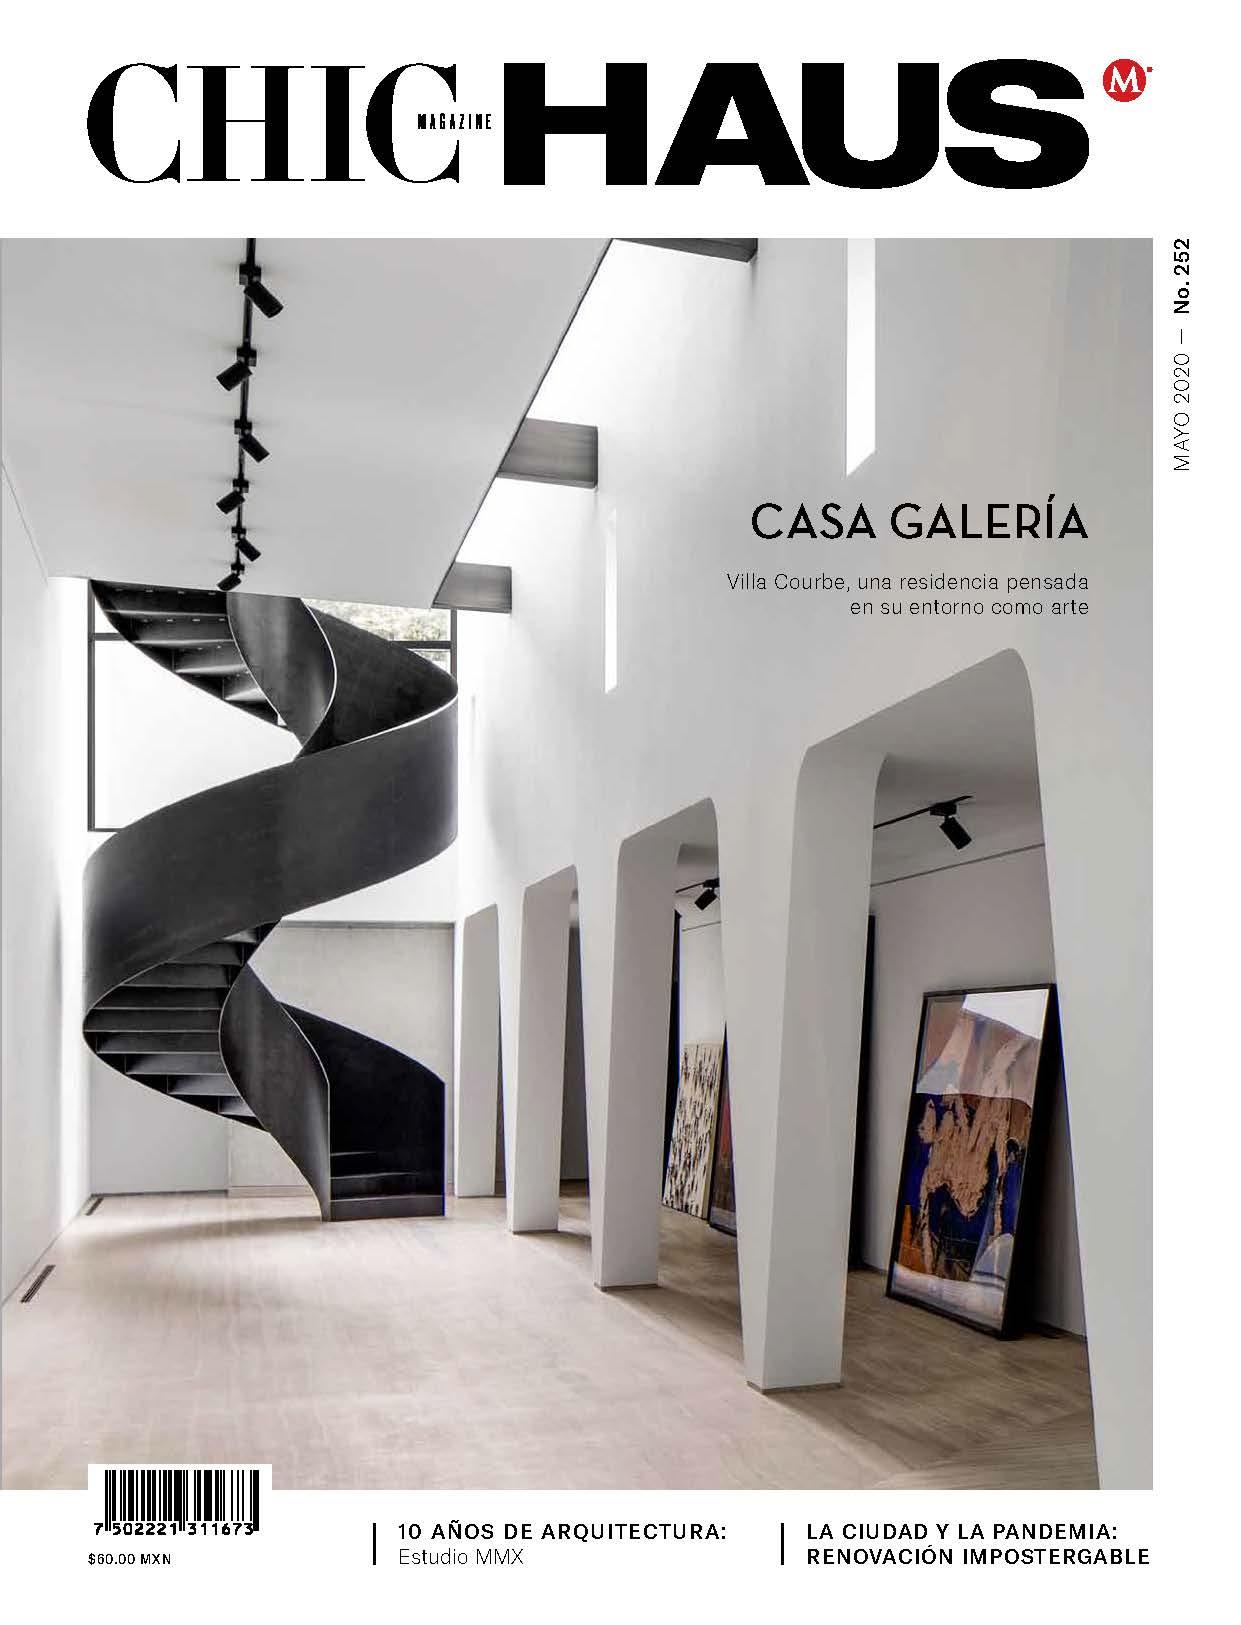 https://www.saota.com/wp-content/uploads/2021/05/2020_05_01_MX_ChicHause_VillaCourbe_Cover.jpg